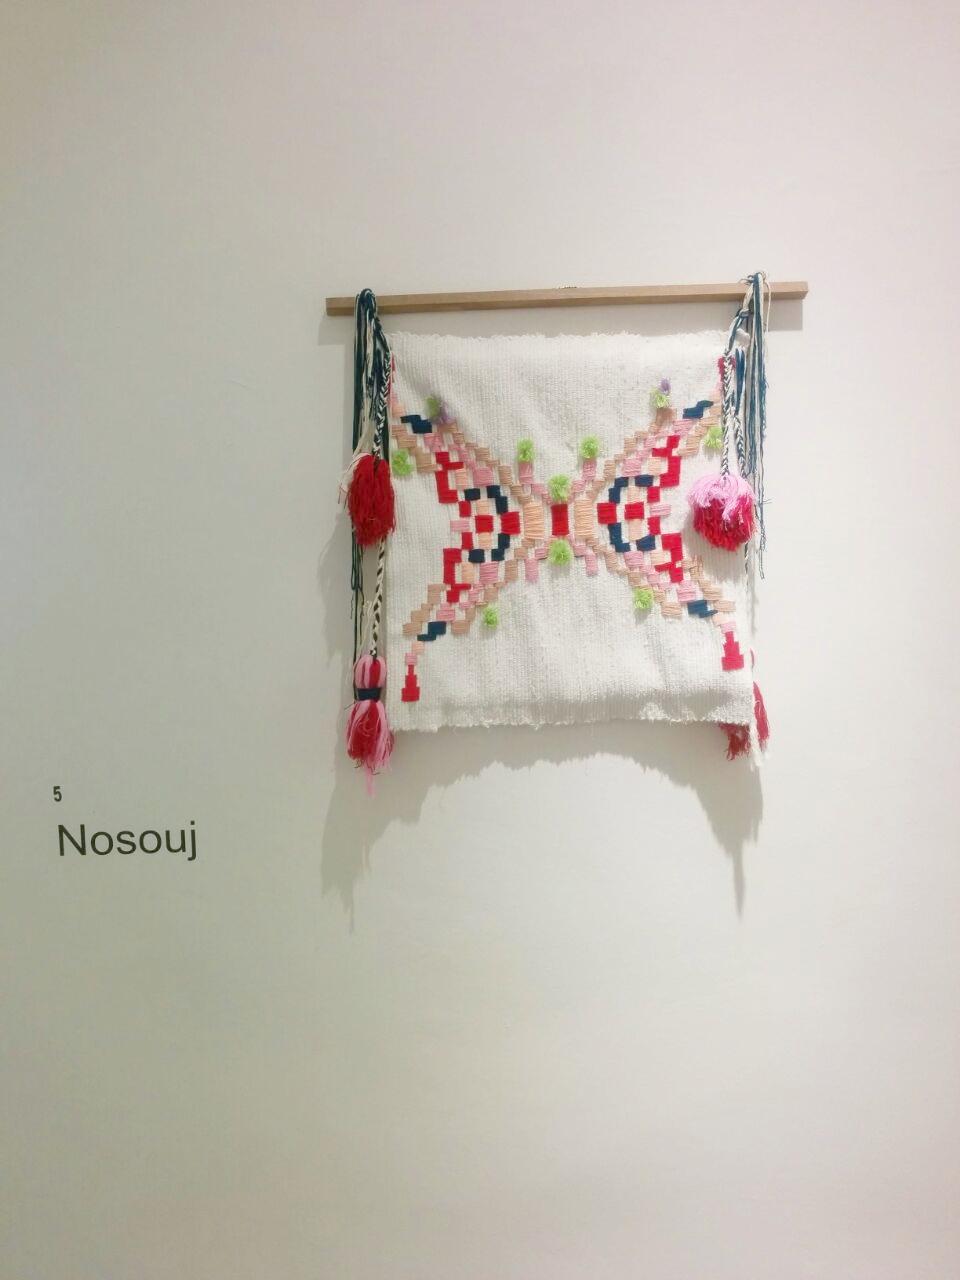 Work by Nosouj